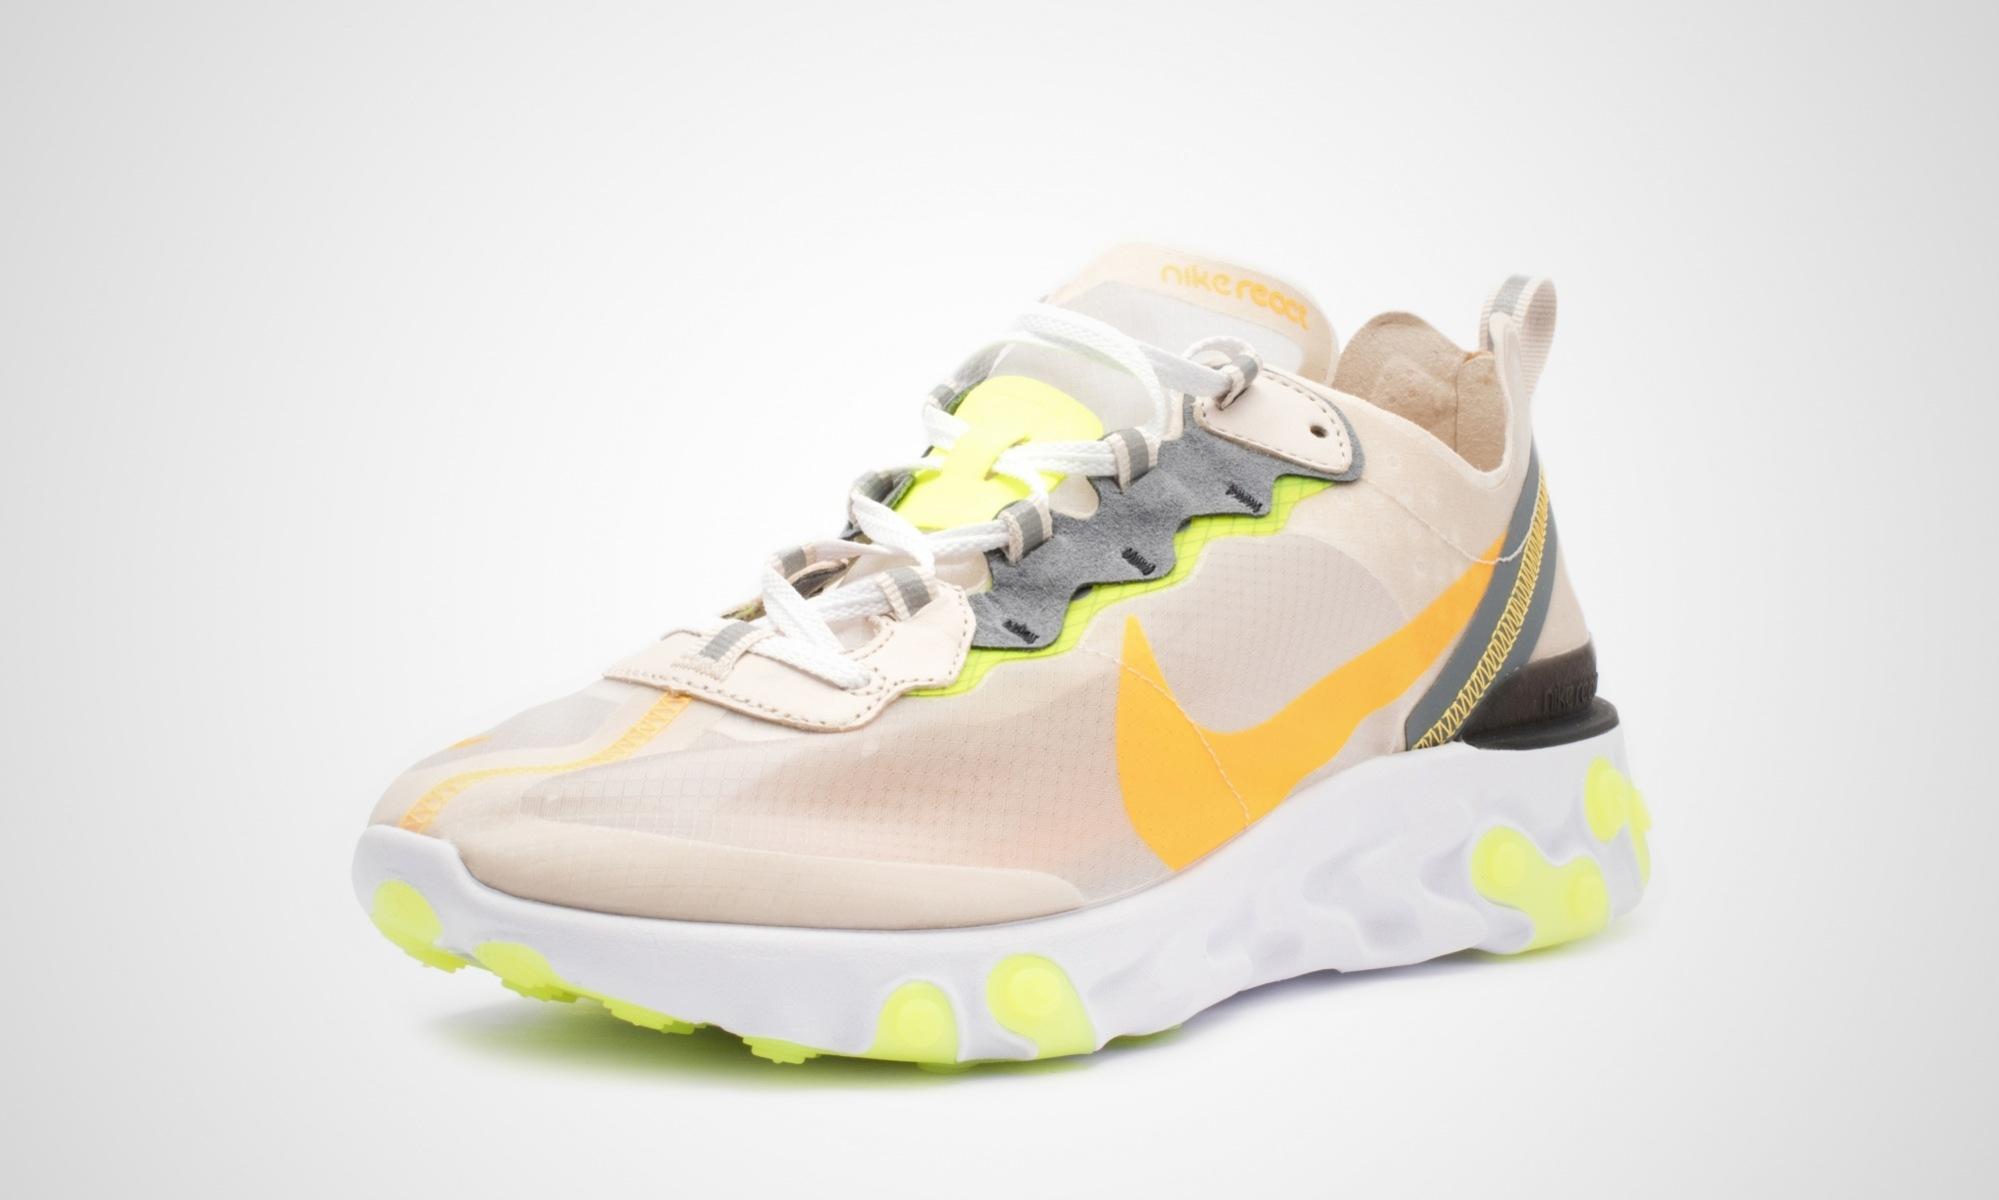 Nike React Element 87 Laser Orange Dead Stock Sneakerblog